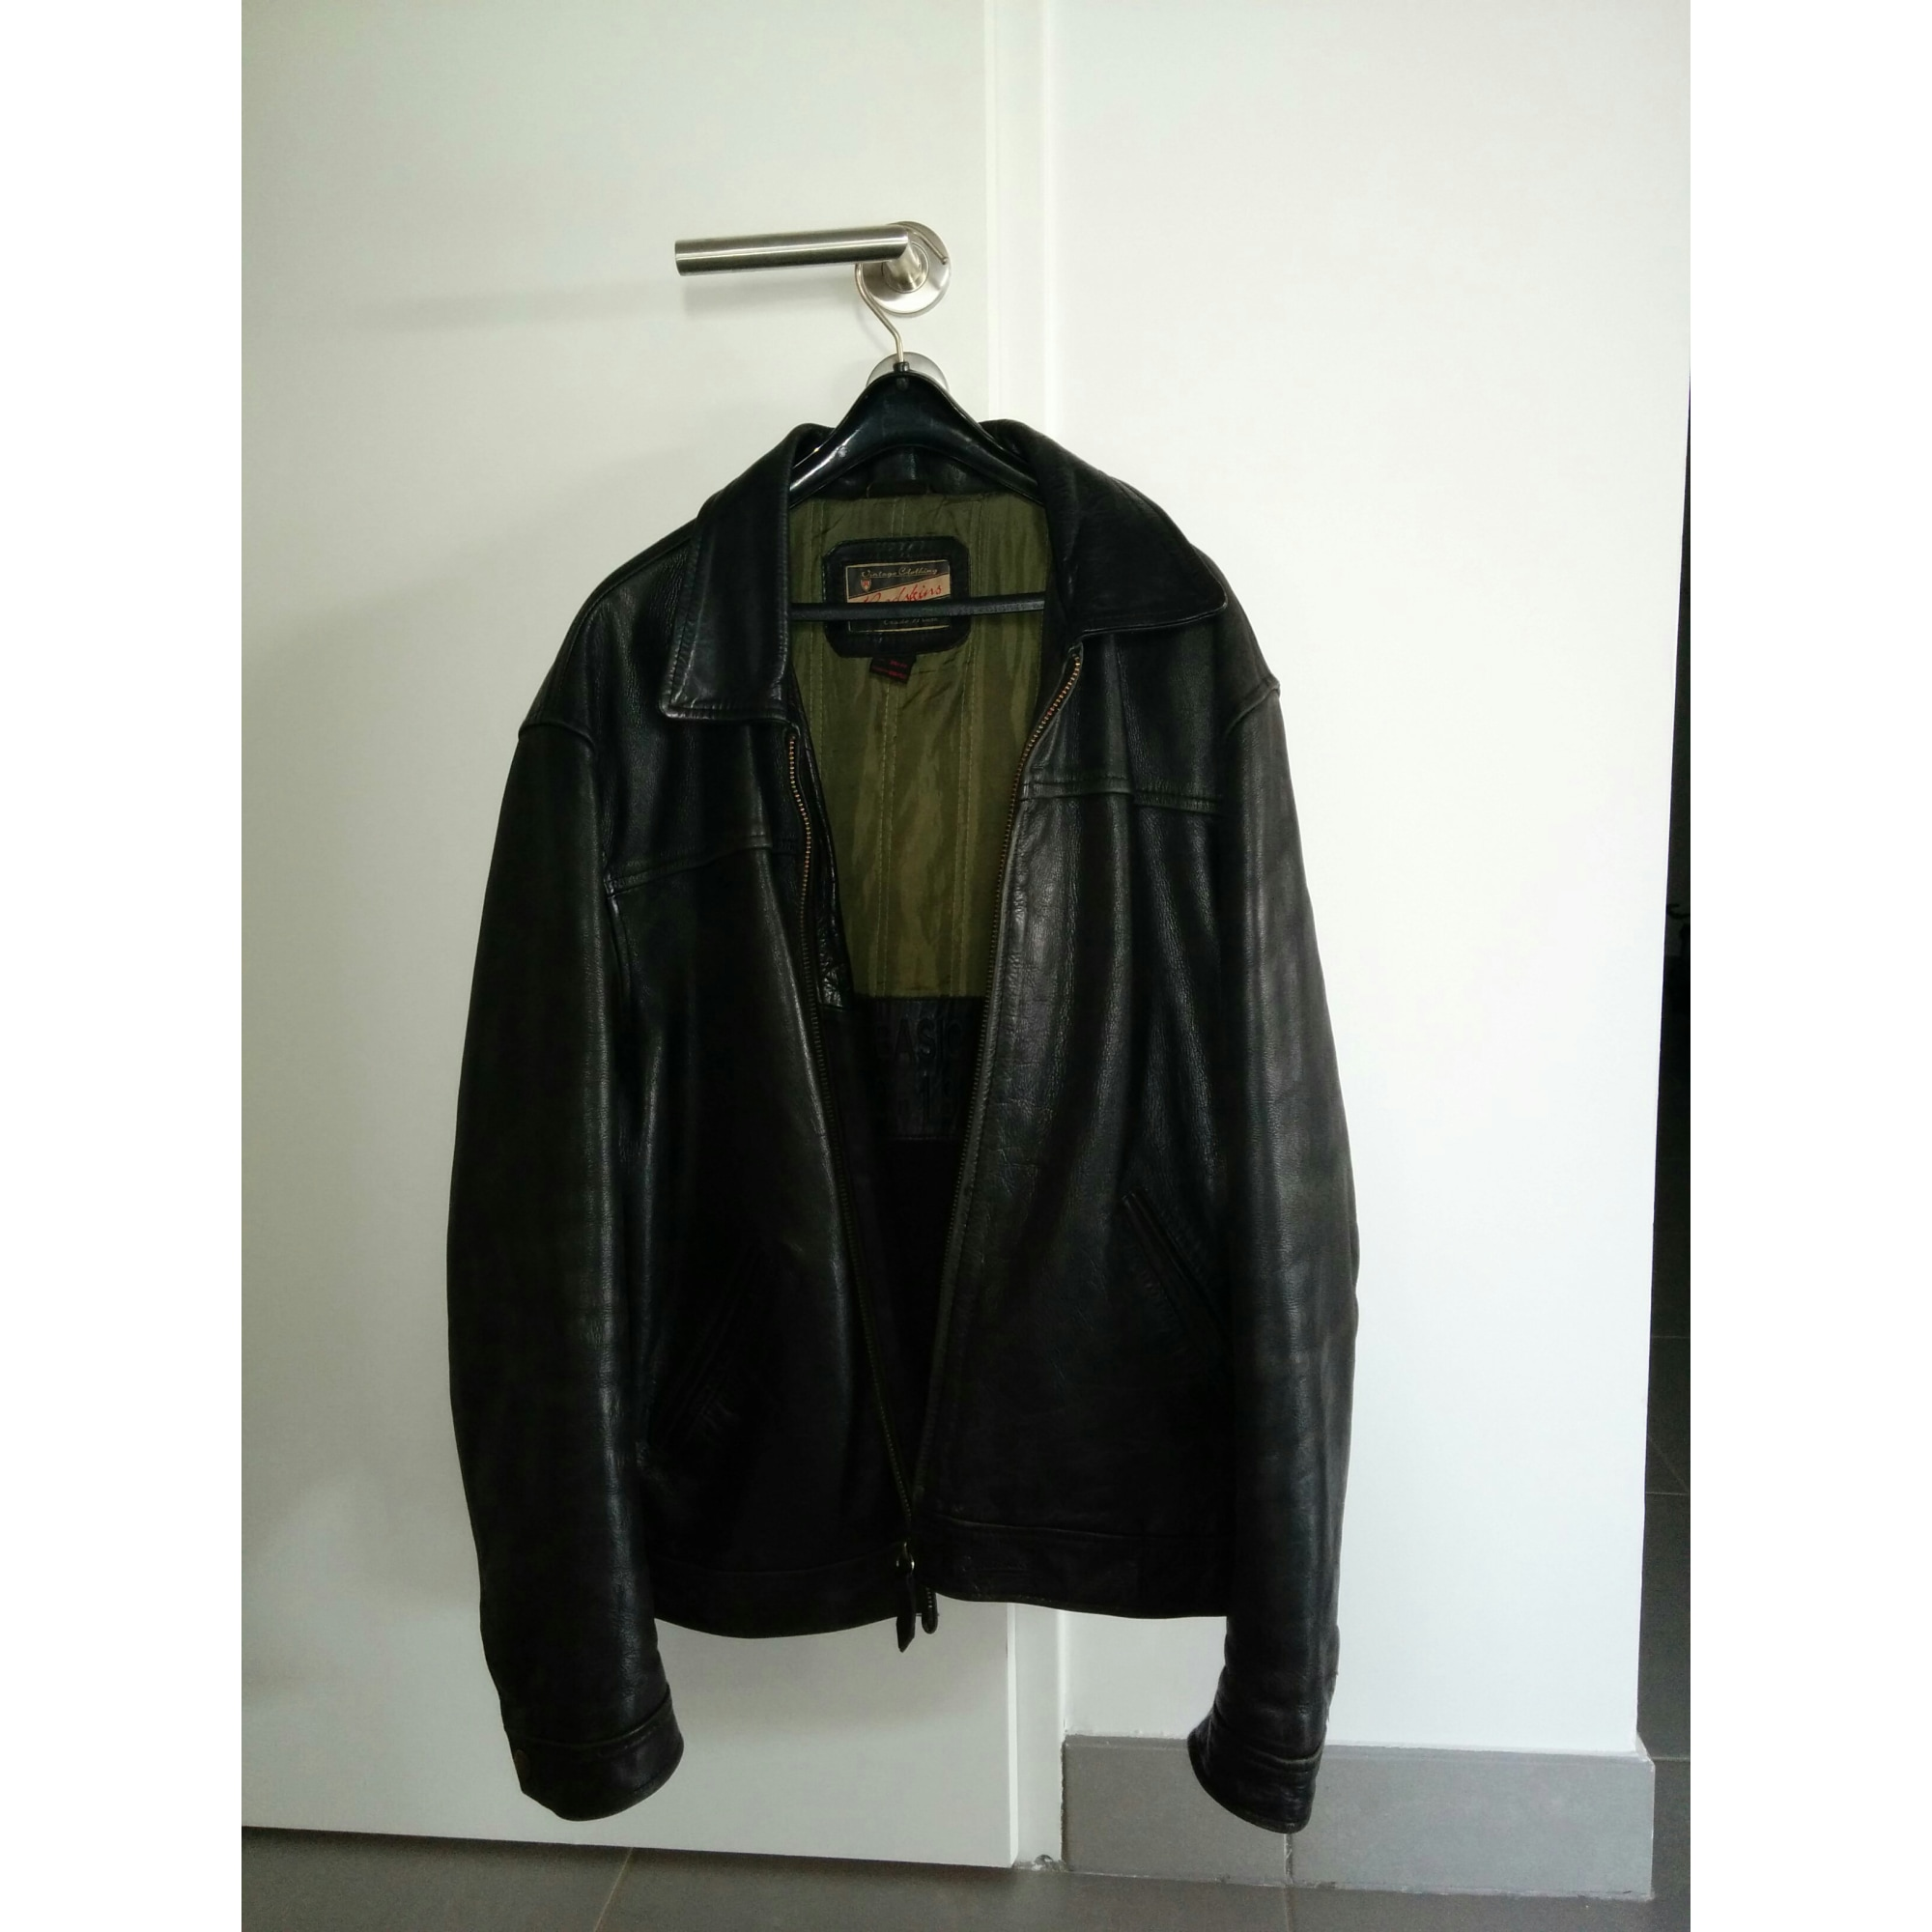 df58fd01ced8 Veste en cuir REDSKINS 50 (M) noir vendu par Yunusova - 4415134